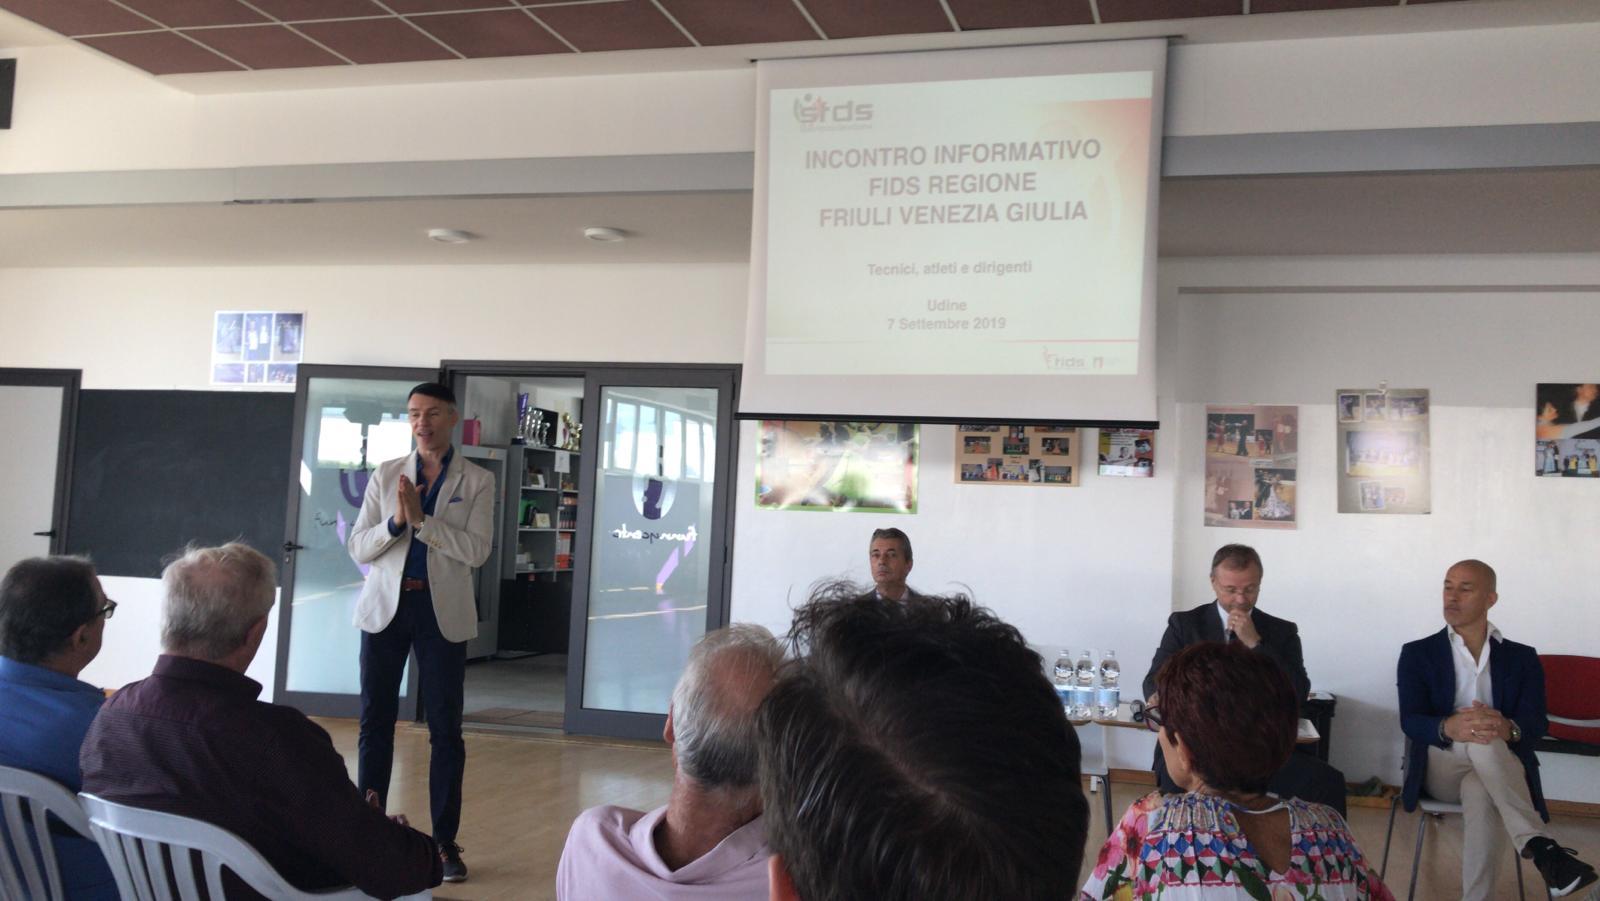 Fids Calendario.Comitato Regionale Friuli Veneziagiulia